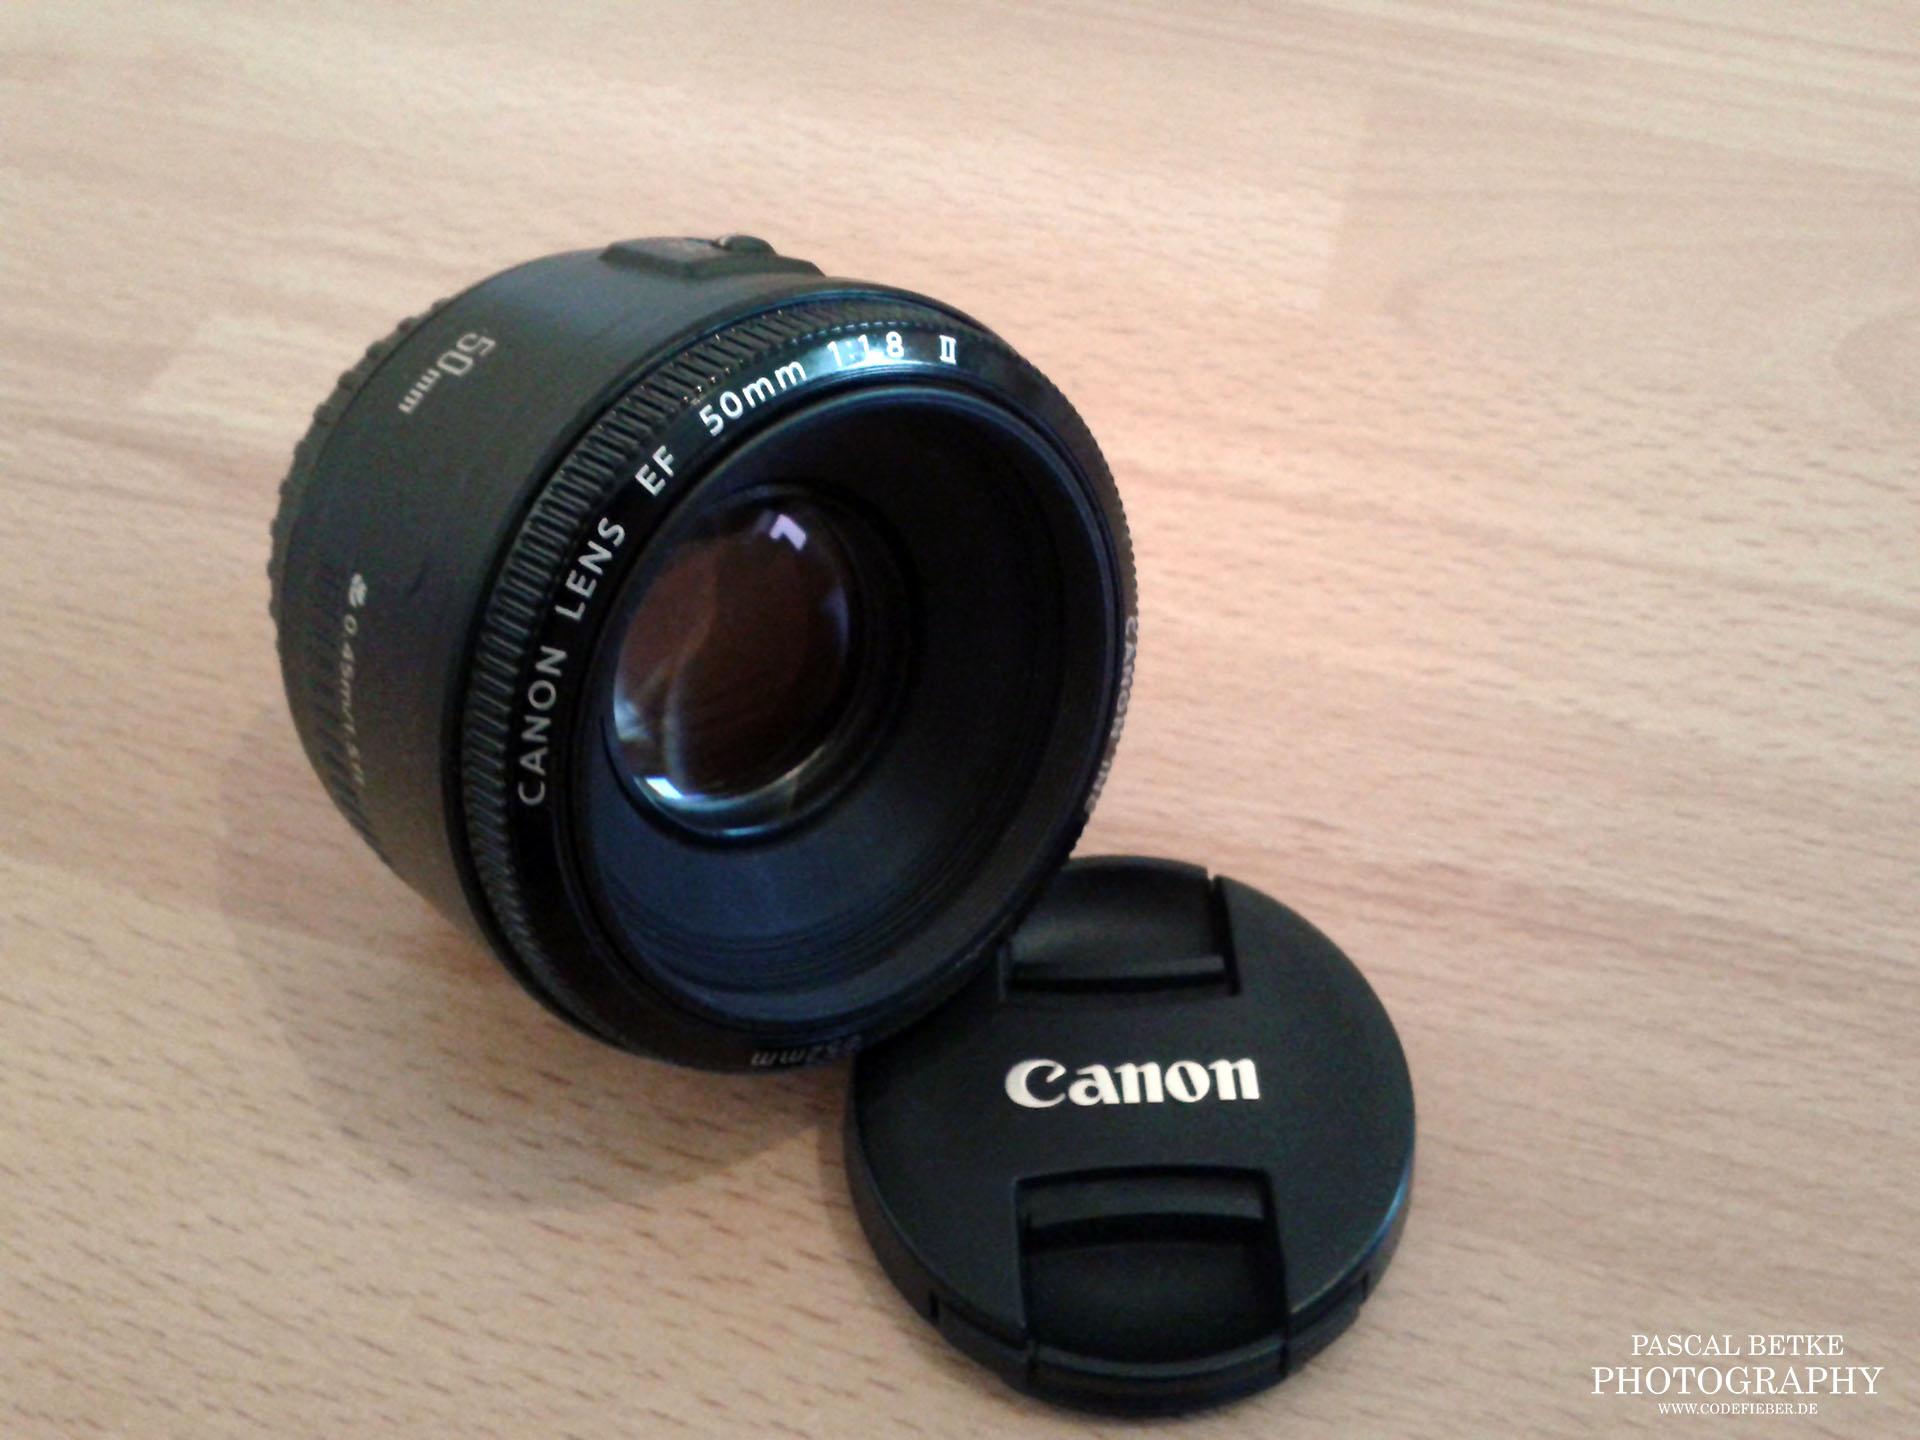 canon 50mm 1.8 objektiv